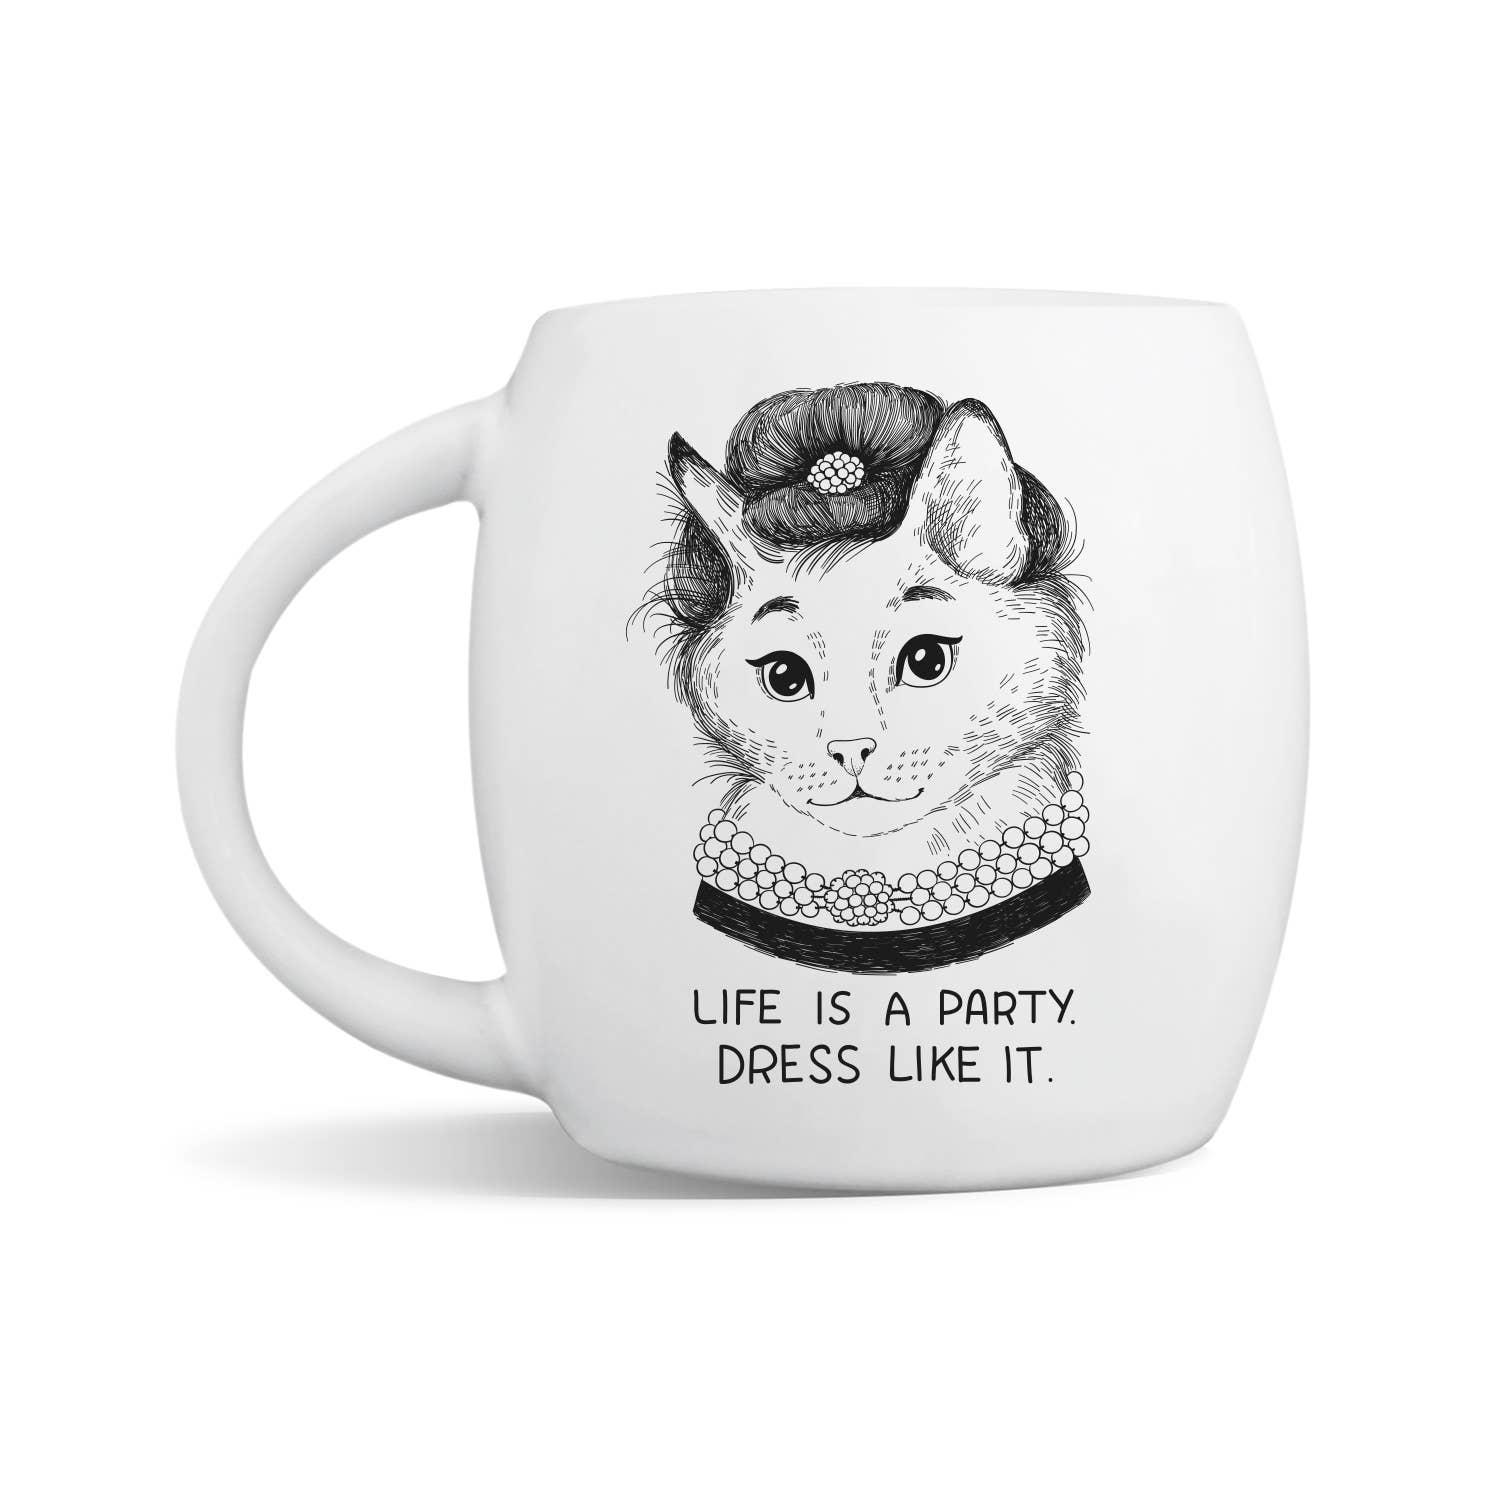 Audrey Hepburn Breakfast at Tiffany's Mug | Trada Marketplace